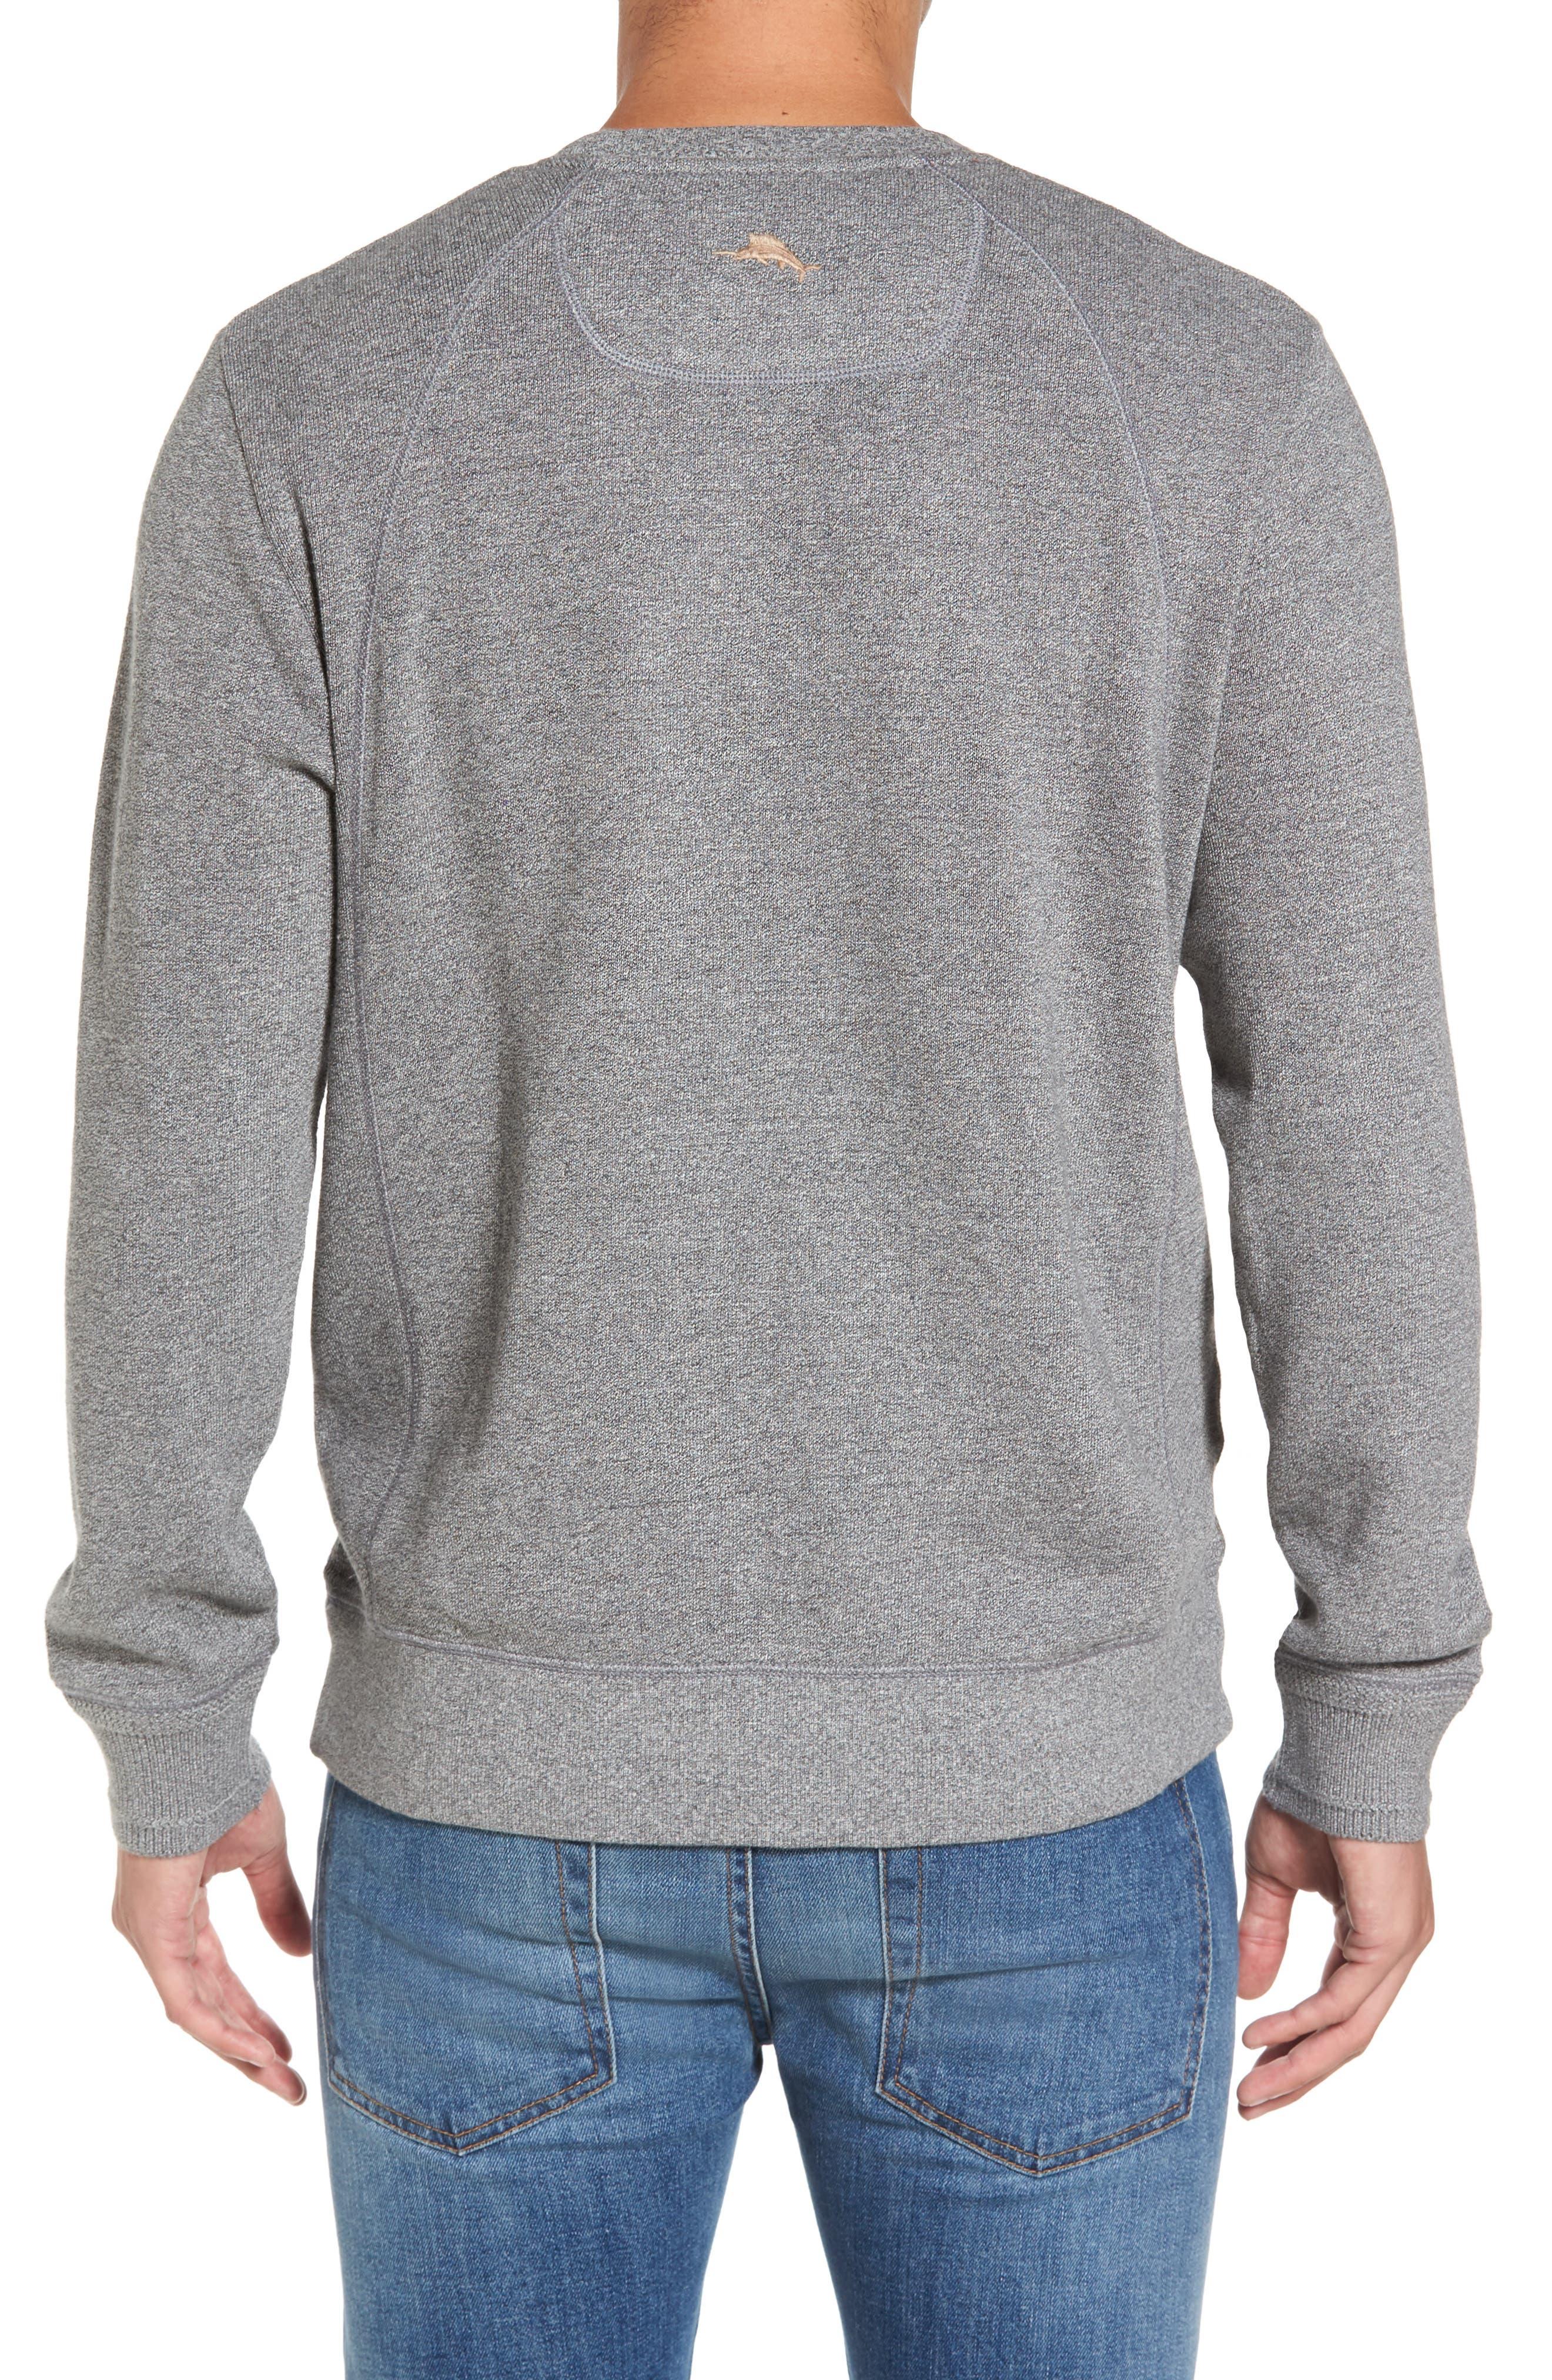 NFL Stitch of Liberty Embroidered Crewneck Sweatshirt,                             Alternate thumbnail 36, color,